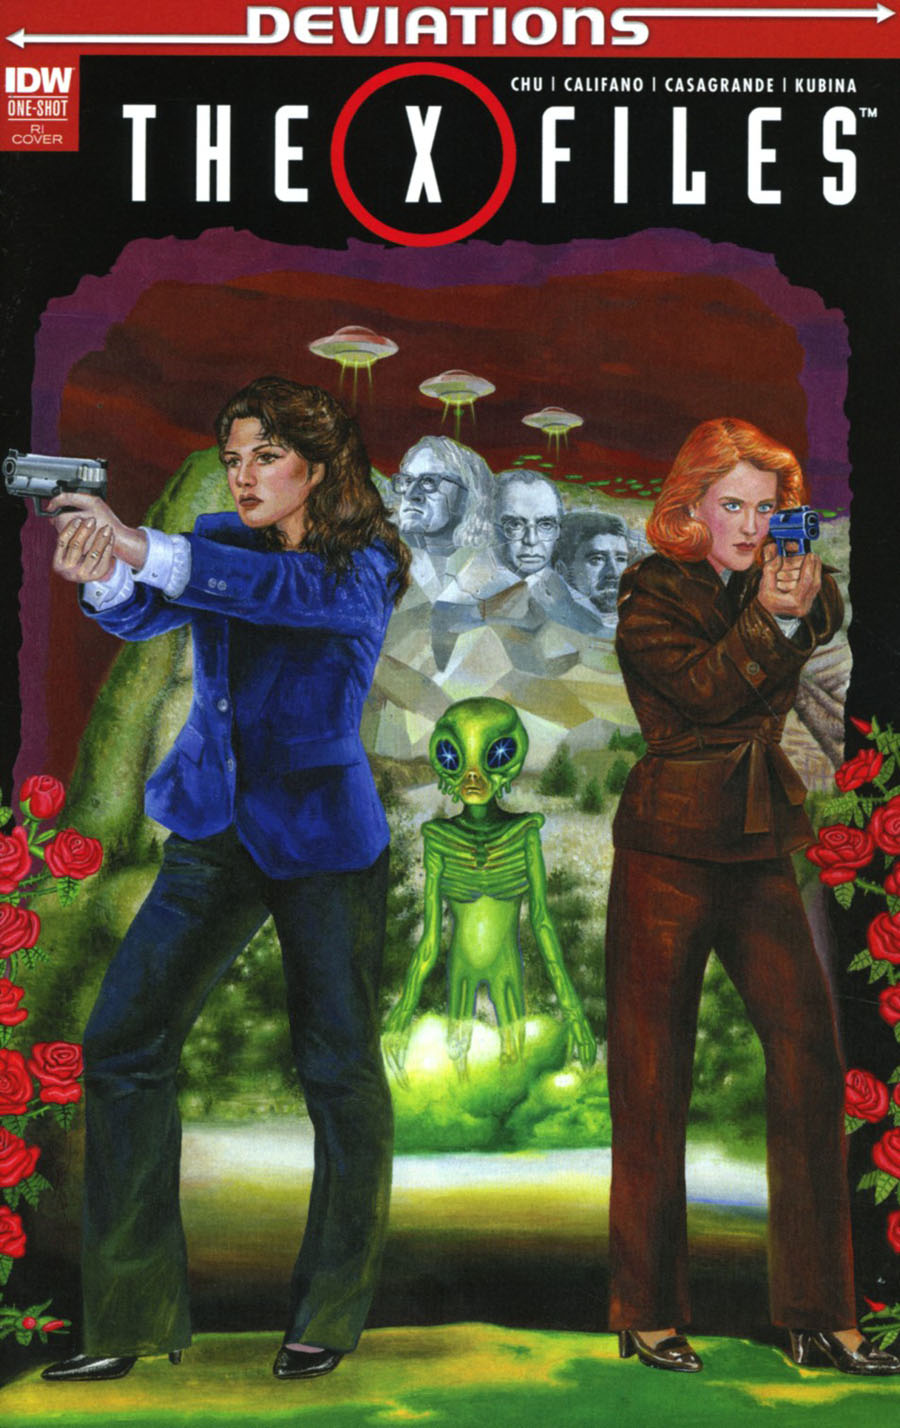 X-Files Deviations 2017 One Shot Cover C Incentive Miran Kim Variant Cover